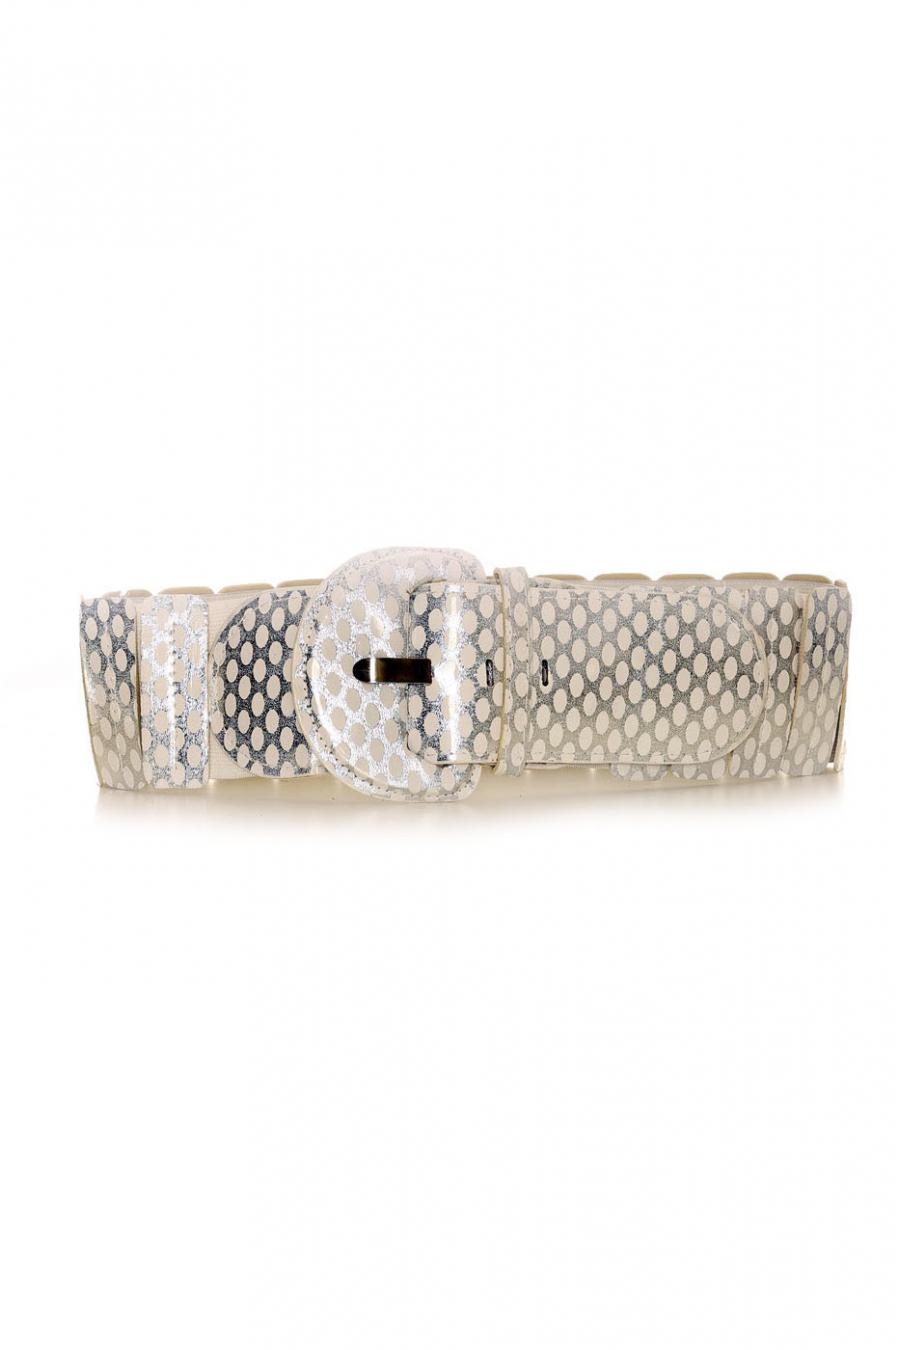 Elastic belt White and silver - BG - P045